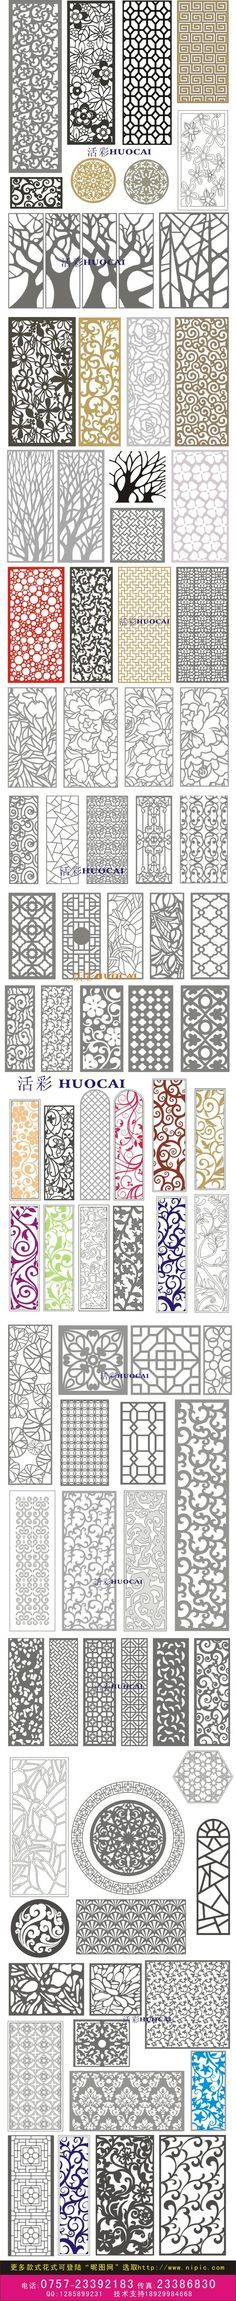 patterns for stencil                                                                                                                                                                                 Plus